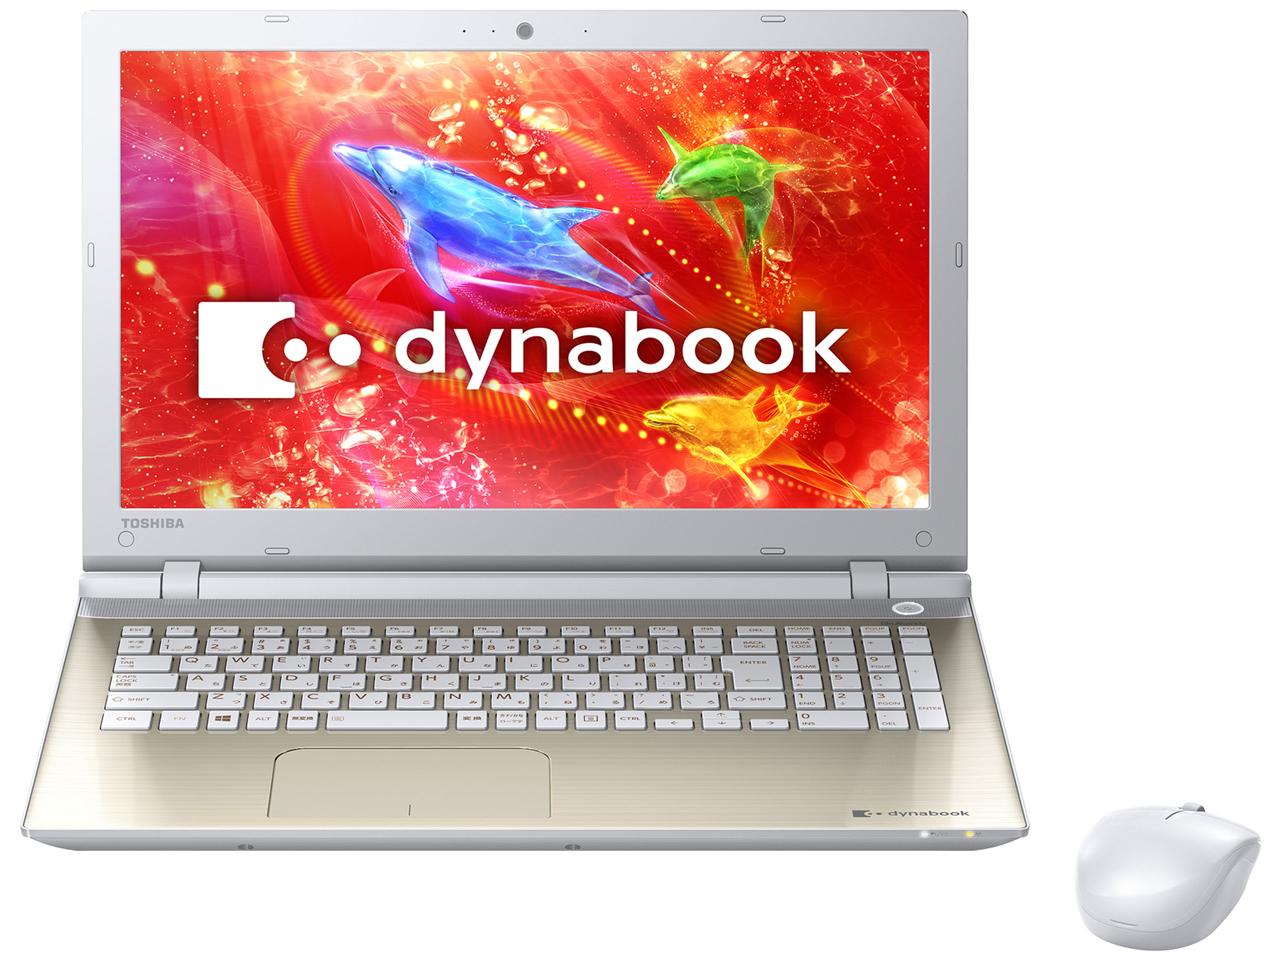 TOSHIBA dynabook T55 PT55RGP-BHA CORE i3 4,096.0MB 1,000.0GB 1,000.0GB 【新品】【送料無料】